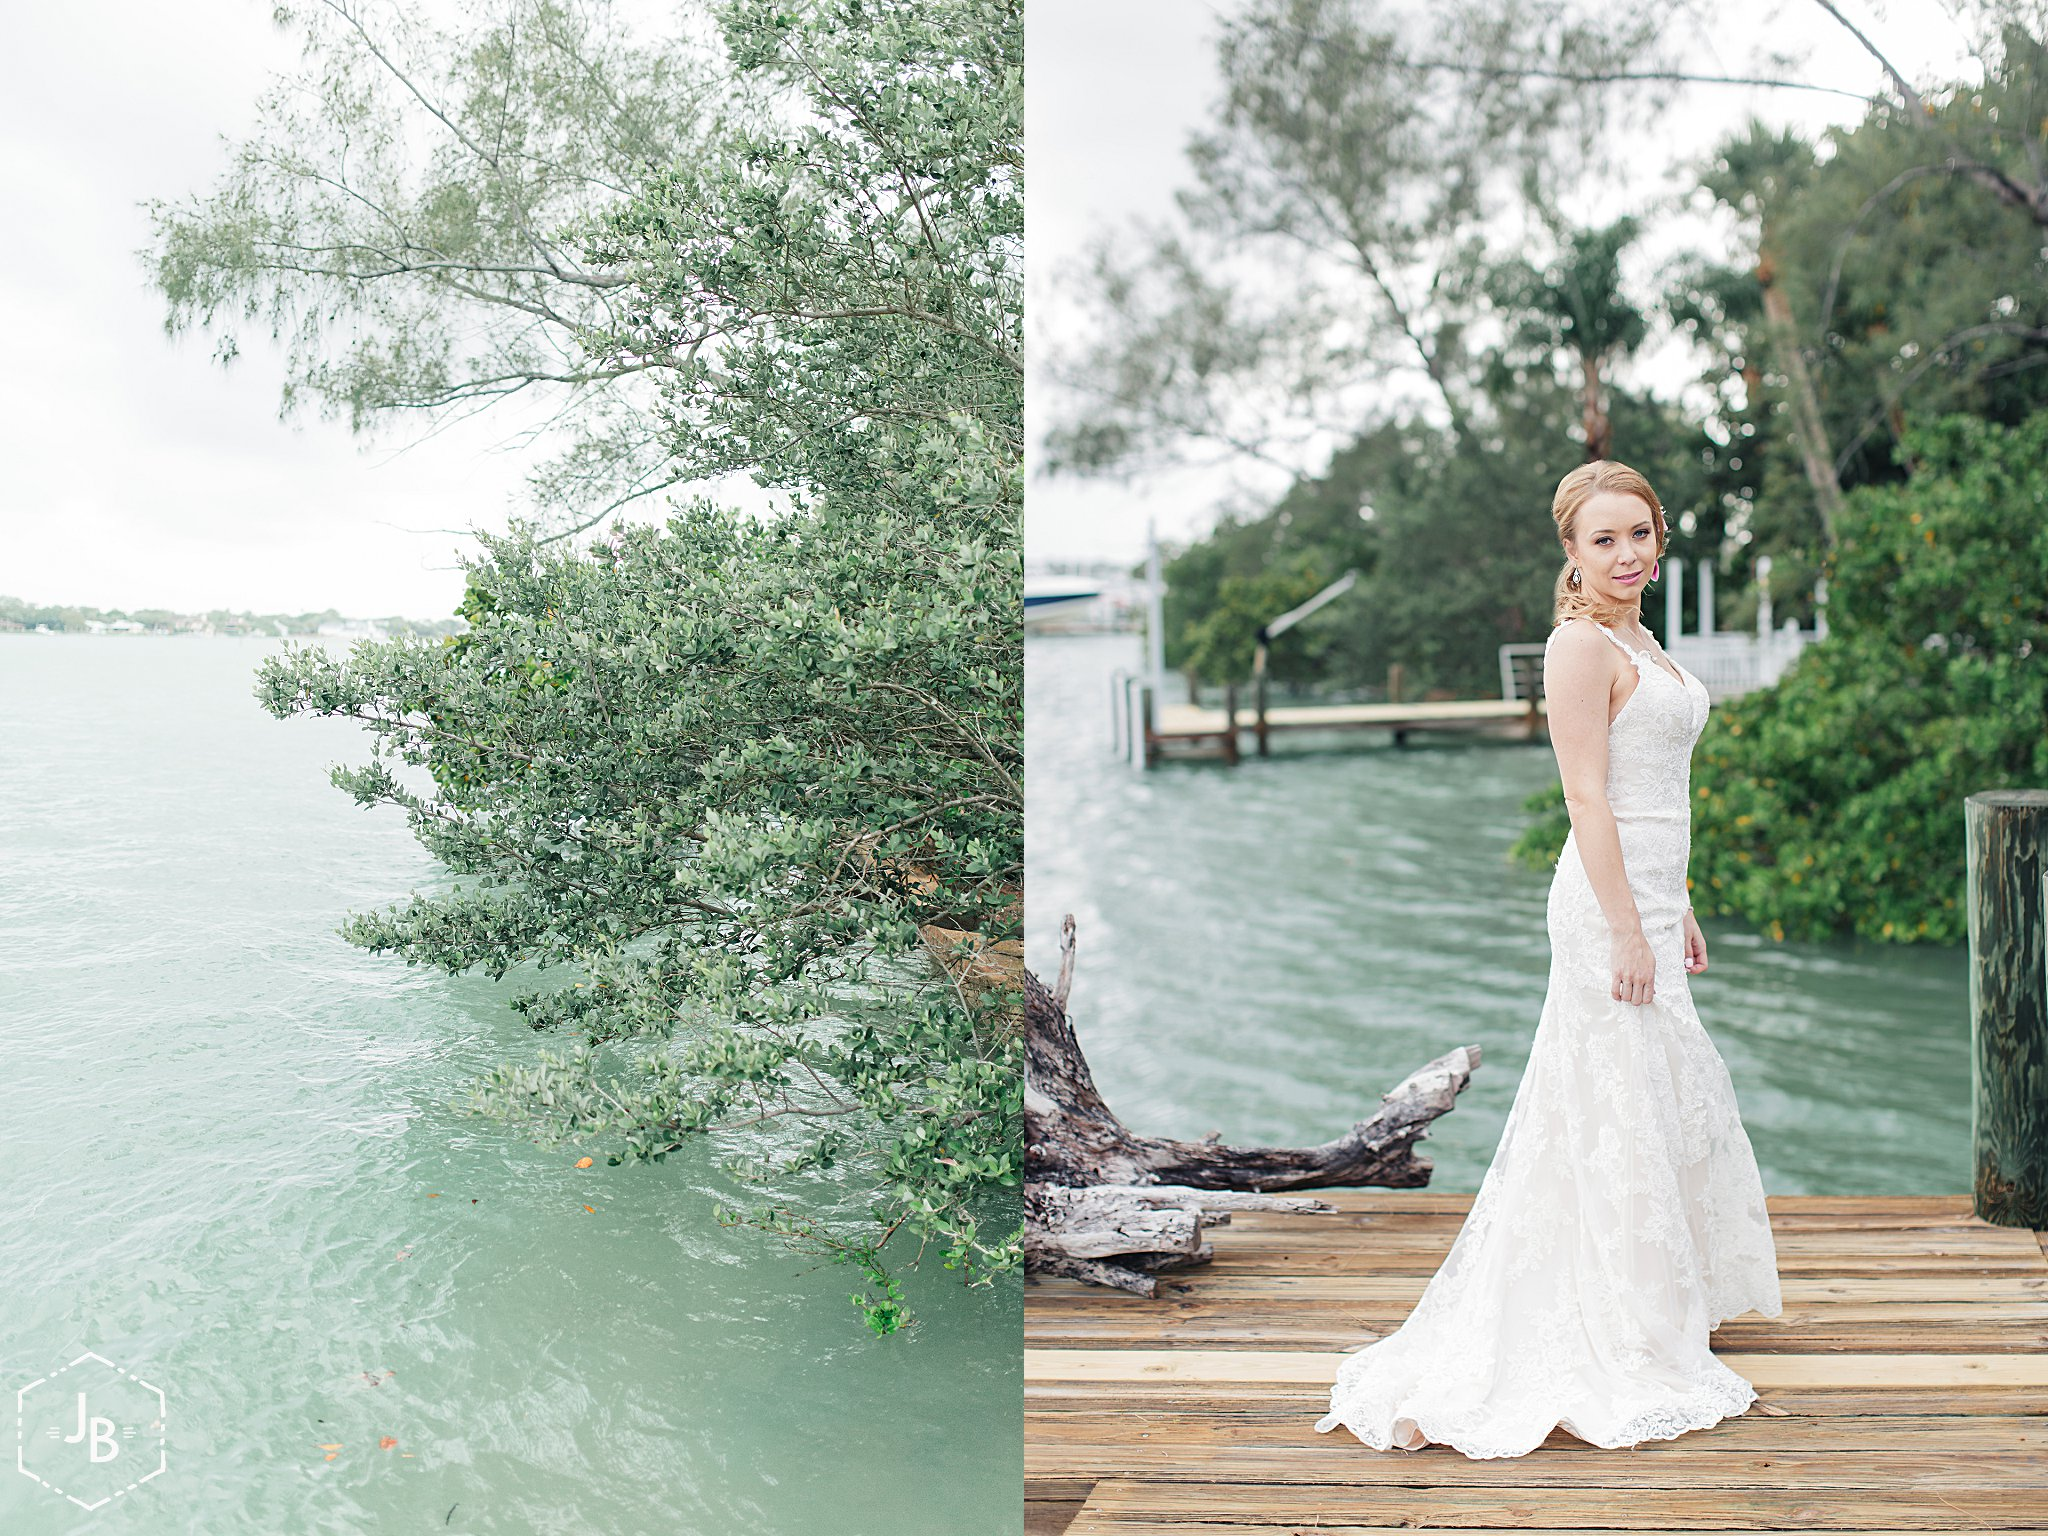 WeddingandEngagementFloridaPhotographer_2065.jpg